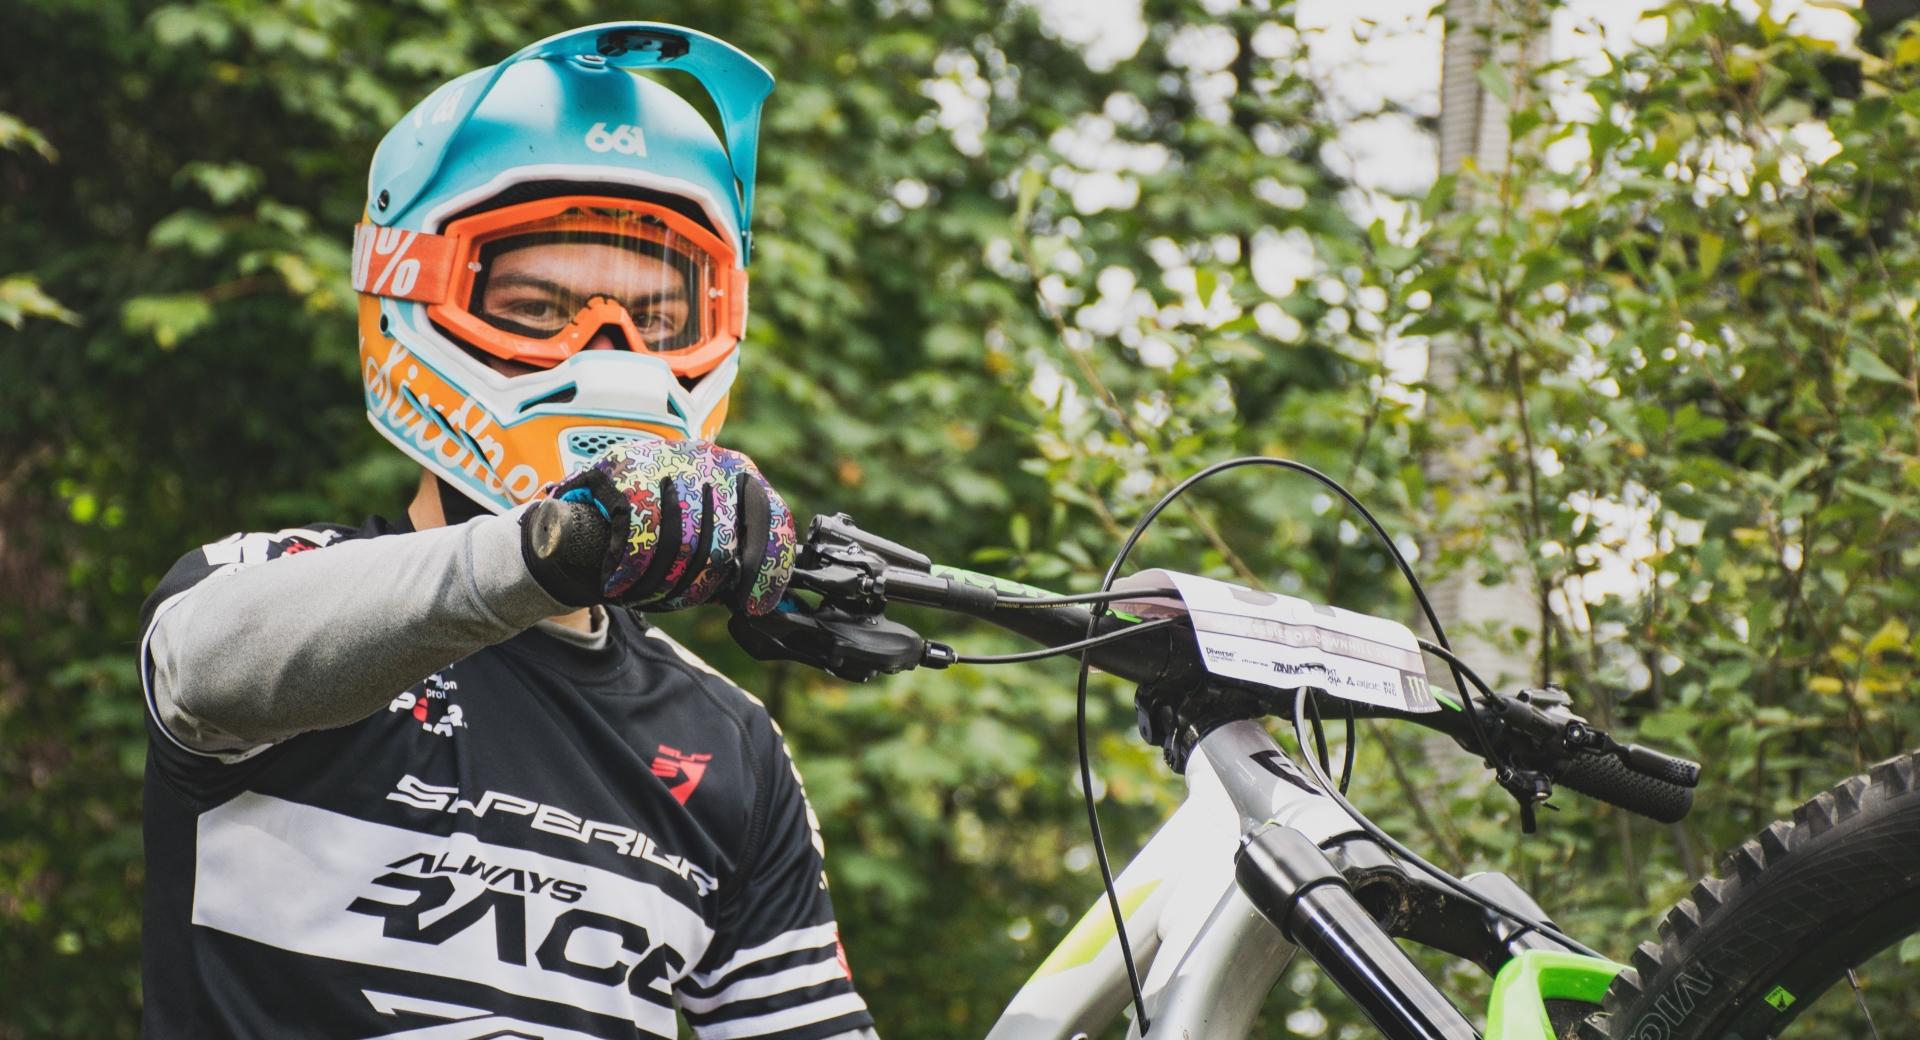 Michał Topór – Local Series of Downhill, Brenna